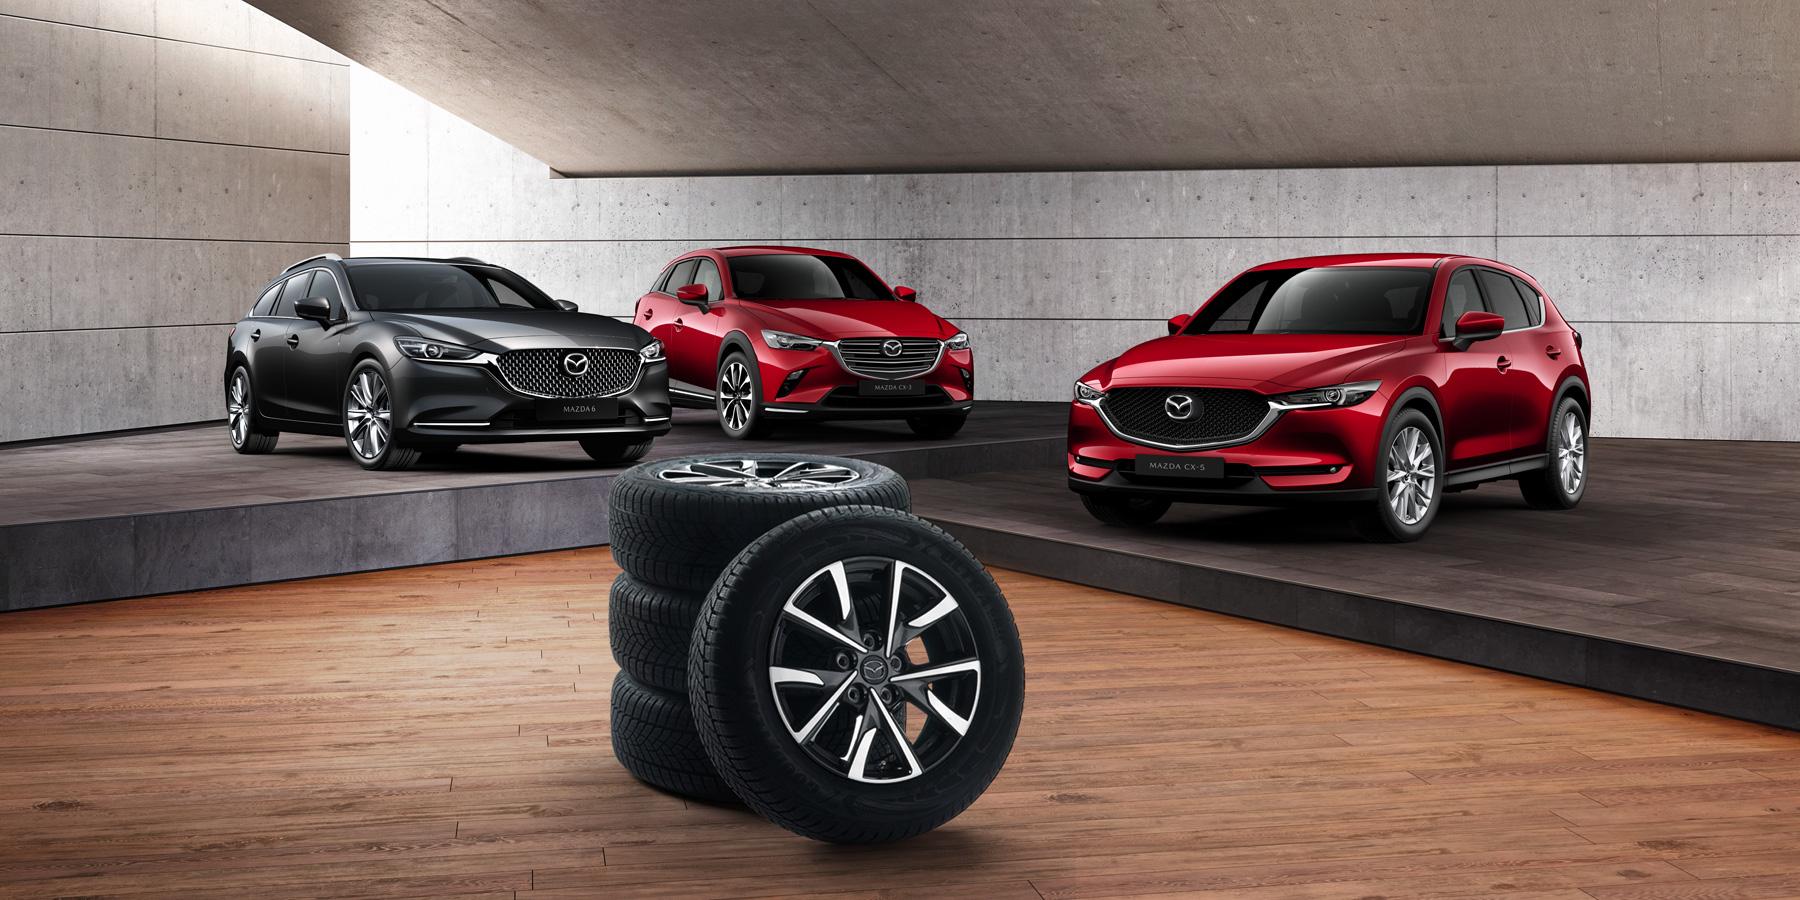 https://krissmer.mazda.at/wp-content/uploads/sites/100/2019/08/Mazda_ReifenAktion2019_1800x900.jpg